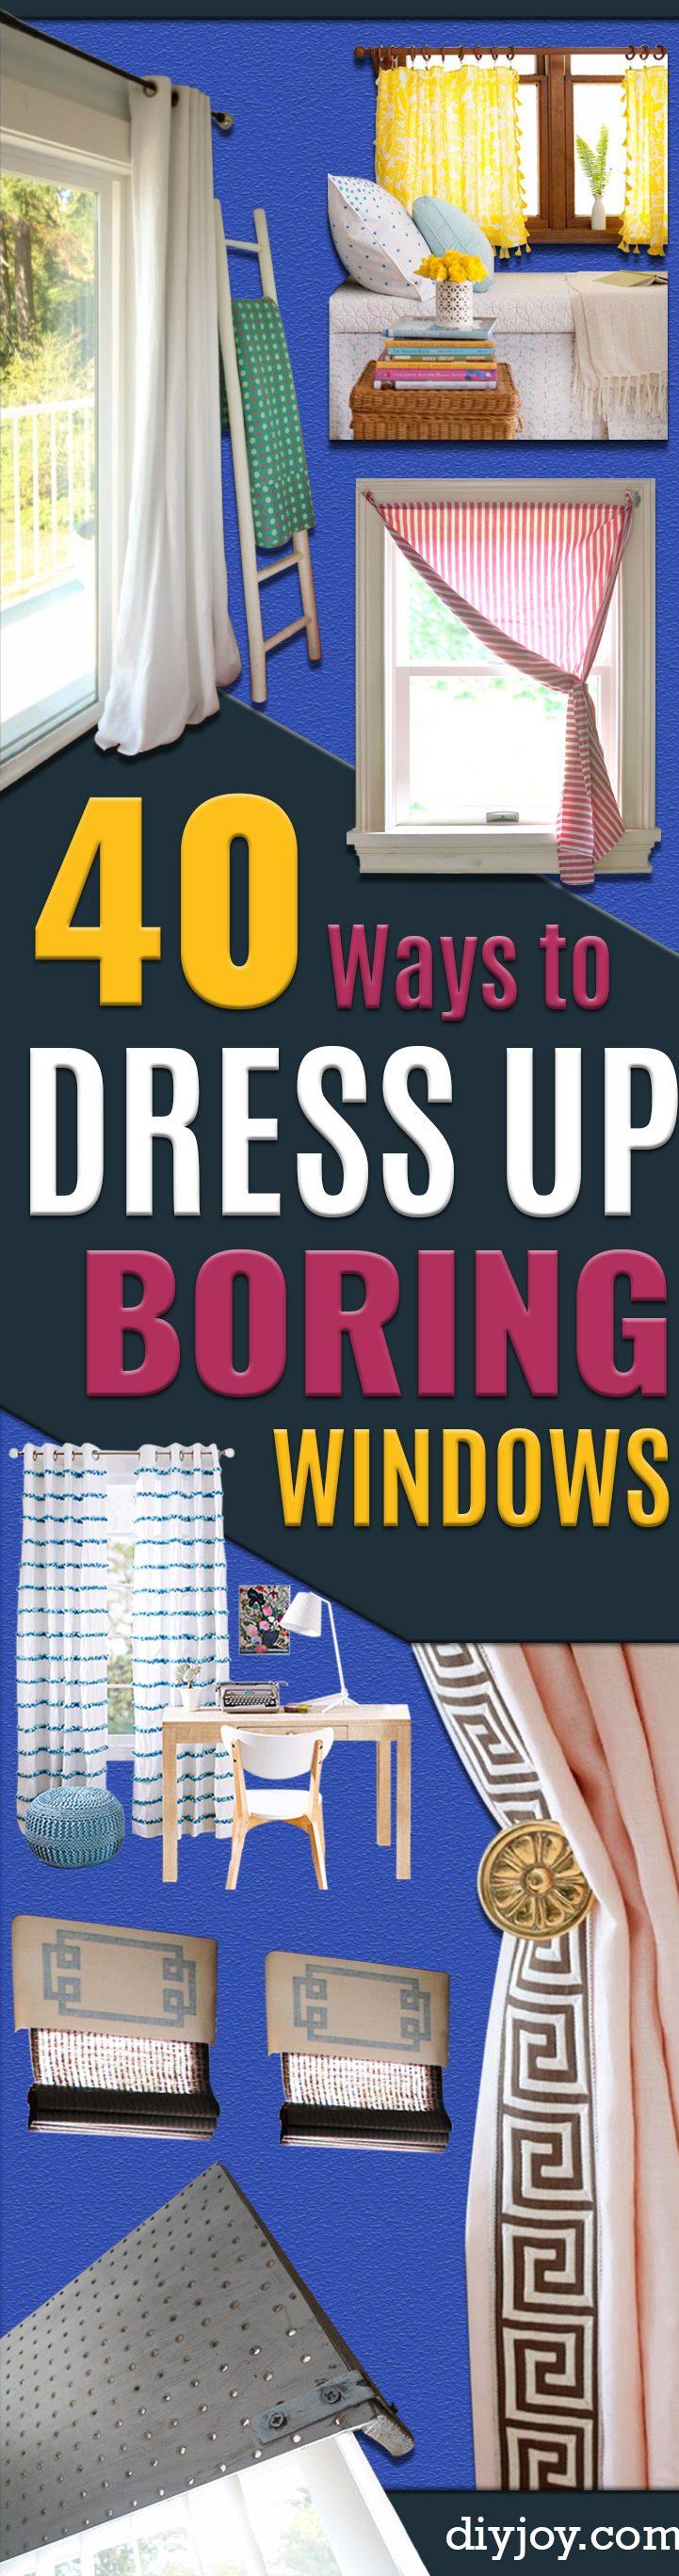 42 Ways to Dress Up Boring Windows